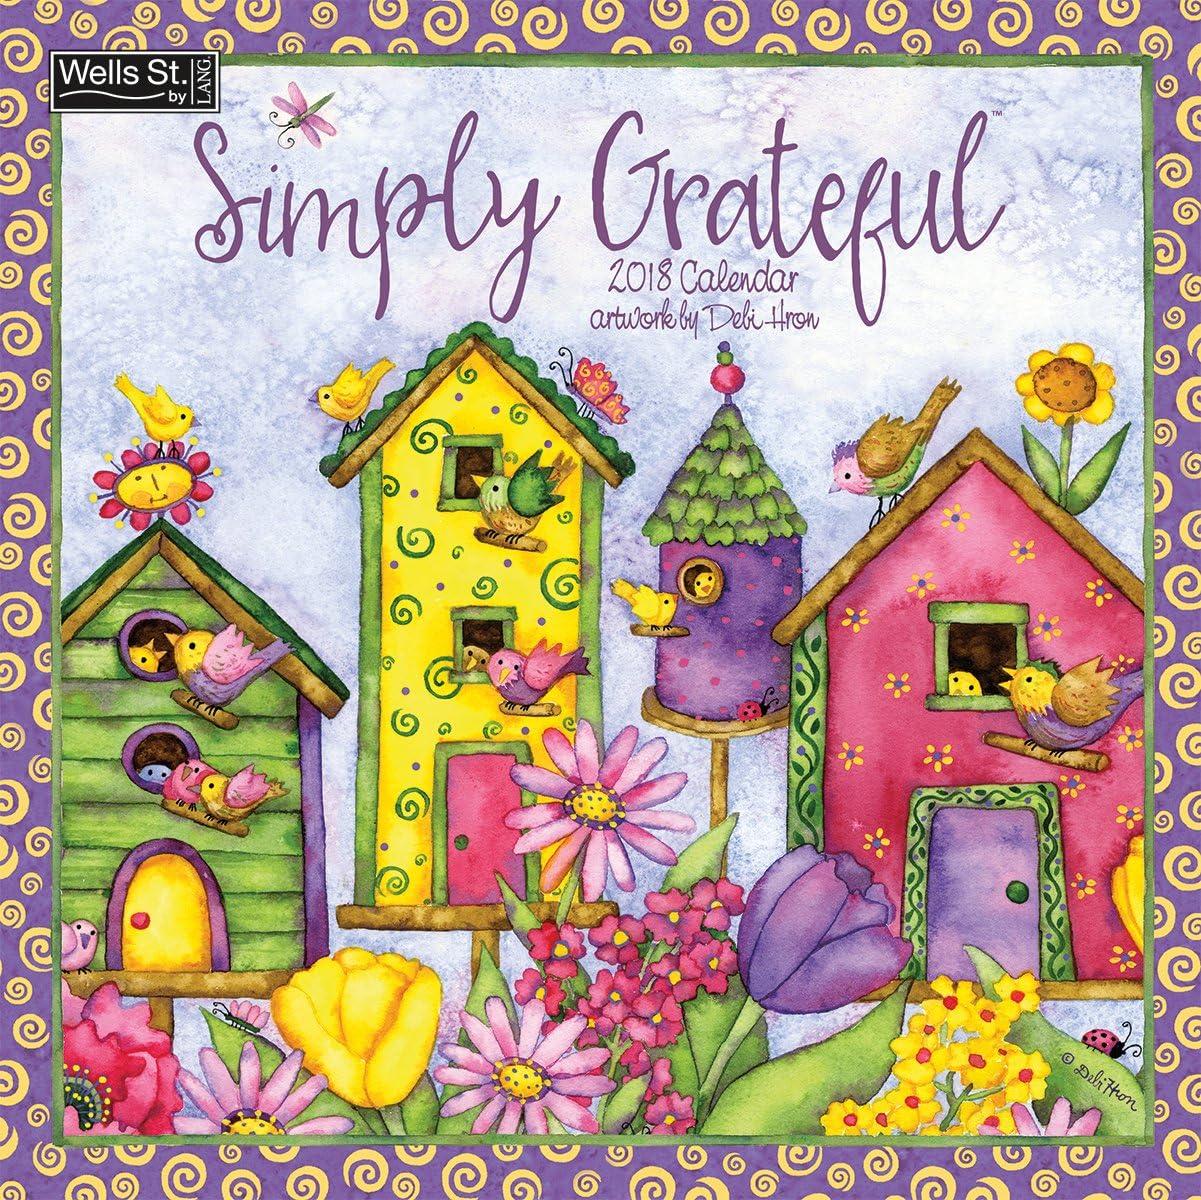 The LANG Companies WSBL Simply Grateful 2018 12X12 Wall Calendar Office Wall Calendar (18997001728)